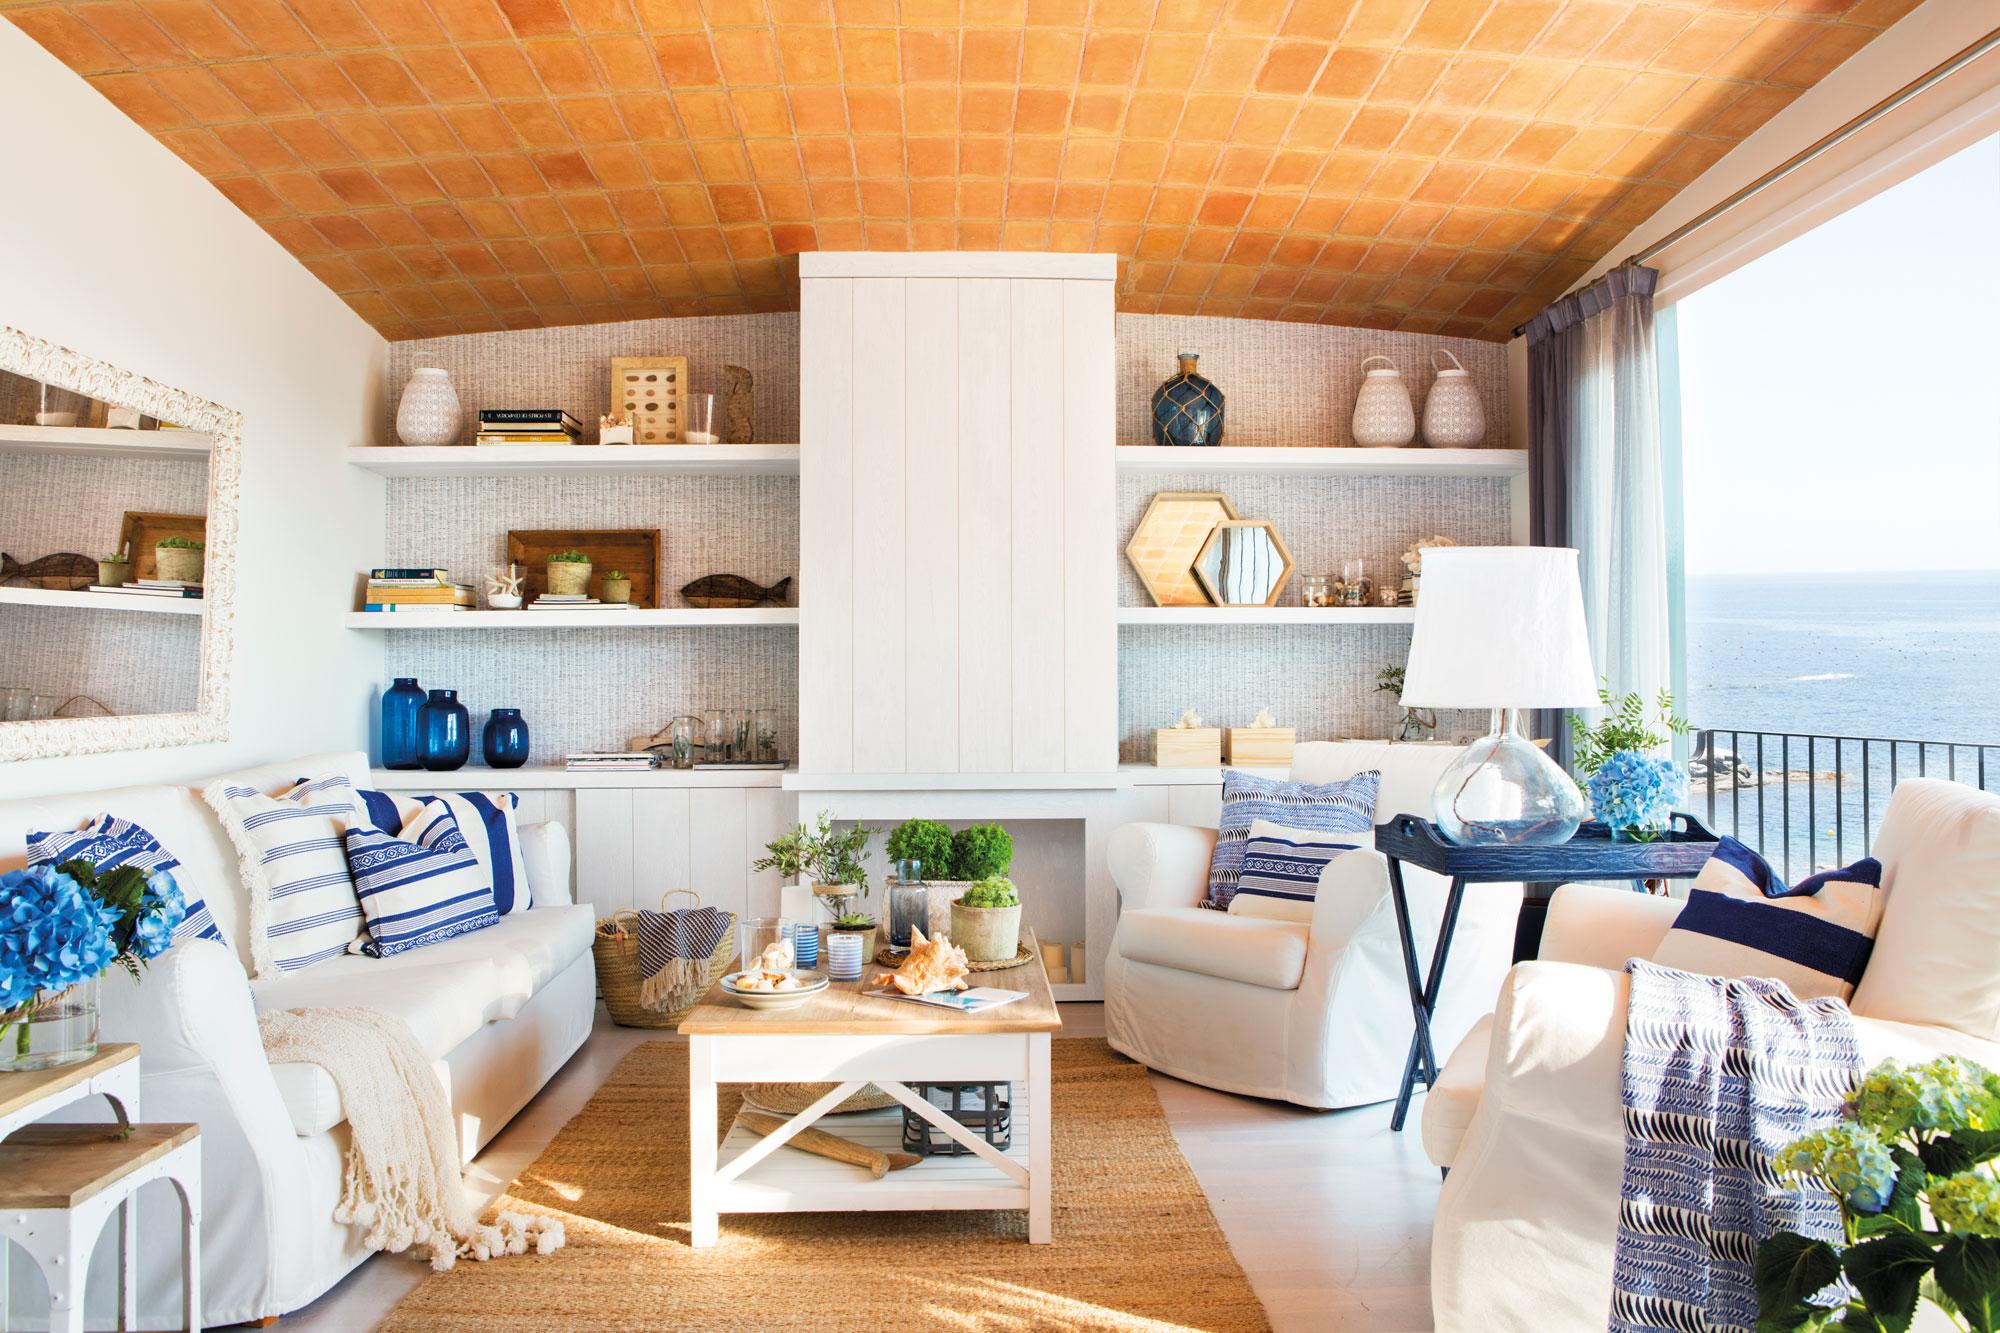 Como decorar tu piso de verano - Como decorar un mueble con papel pintado ...